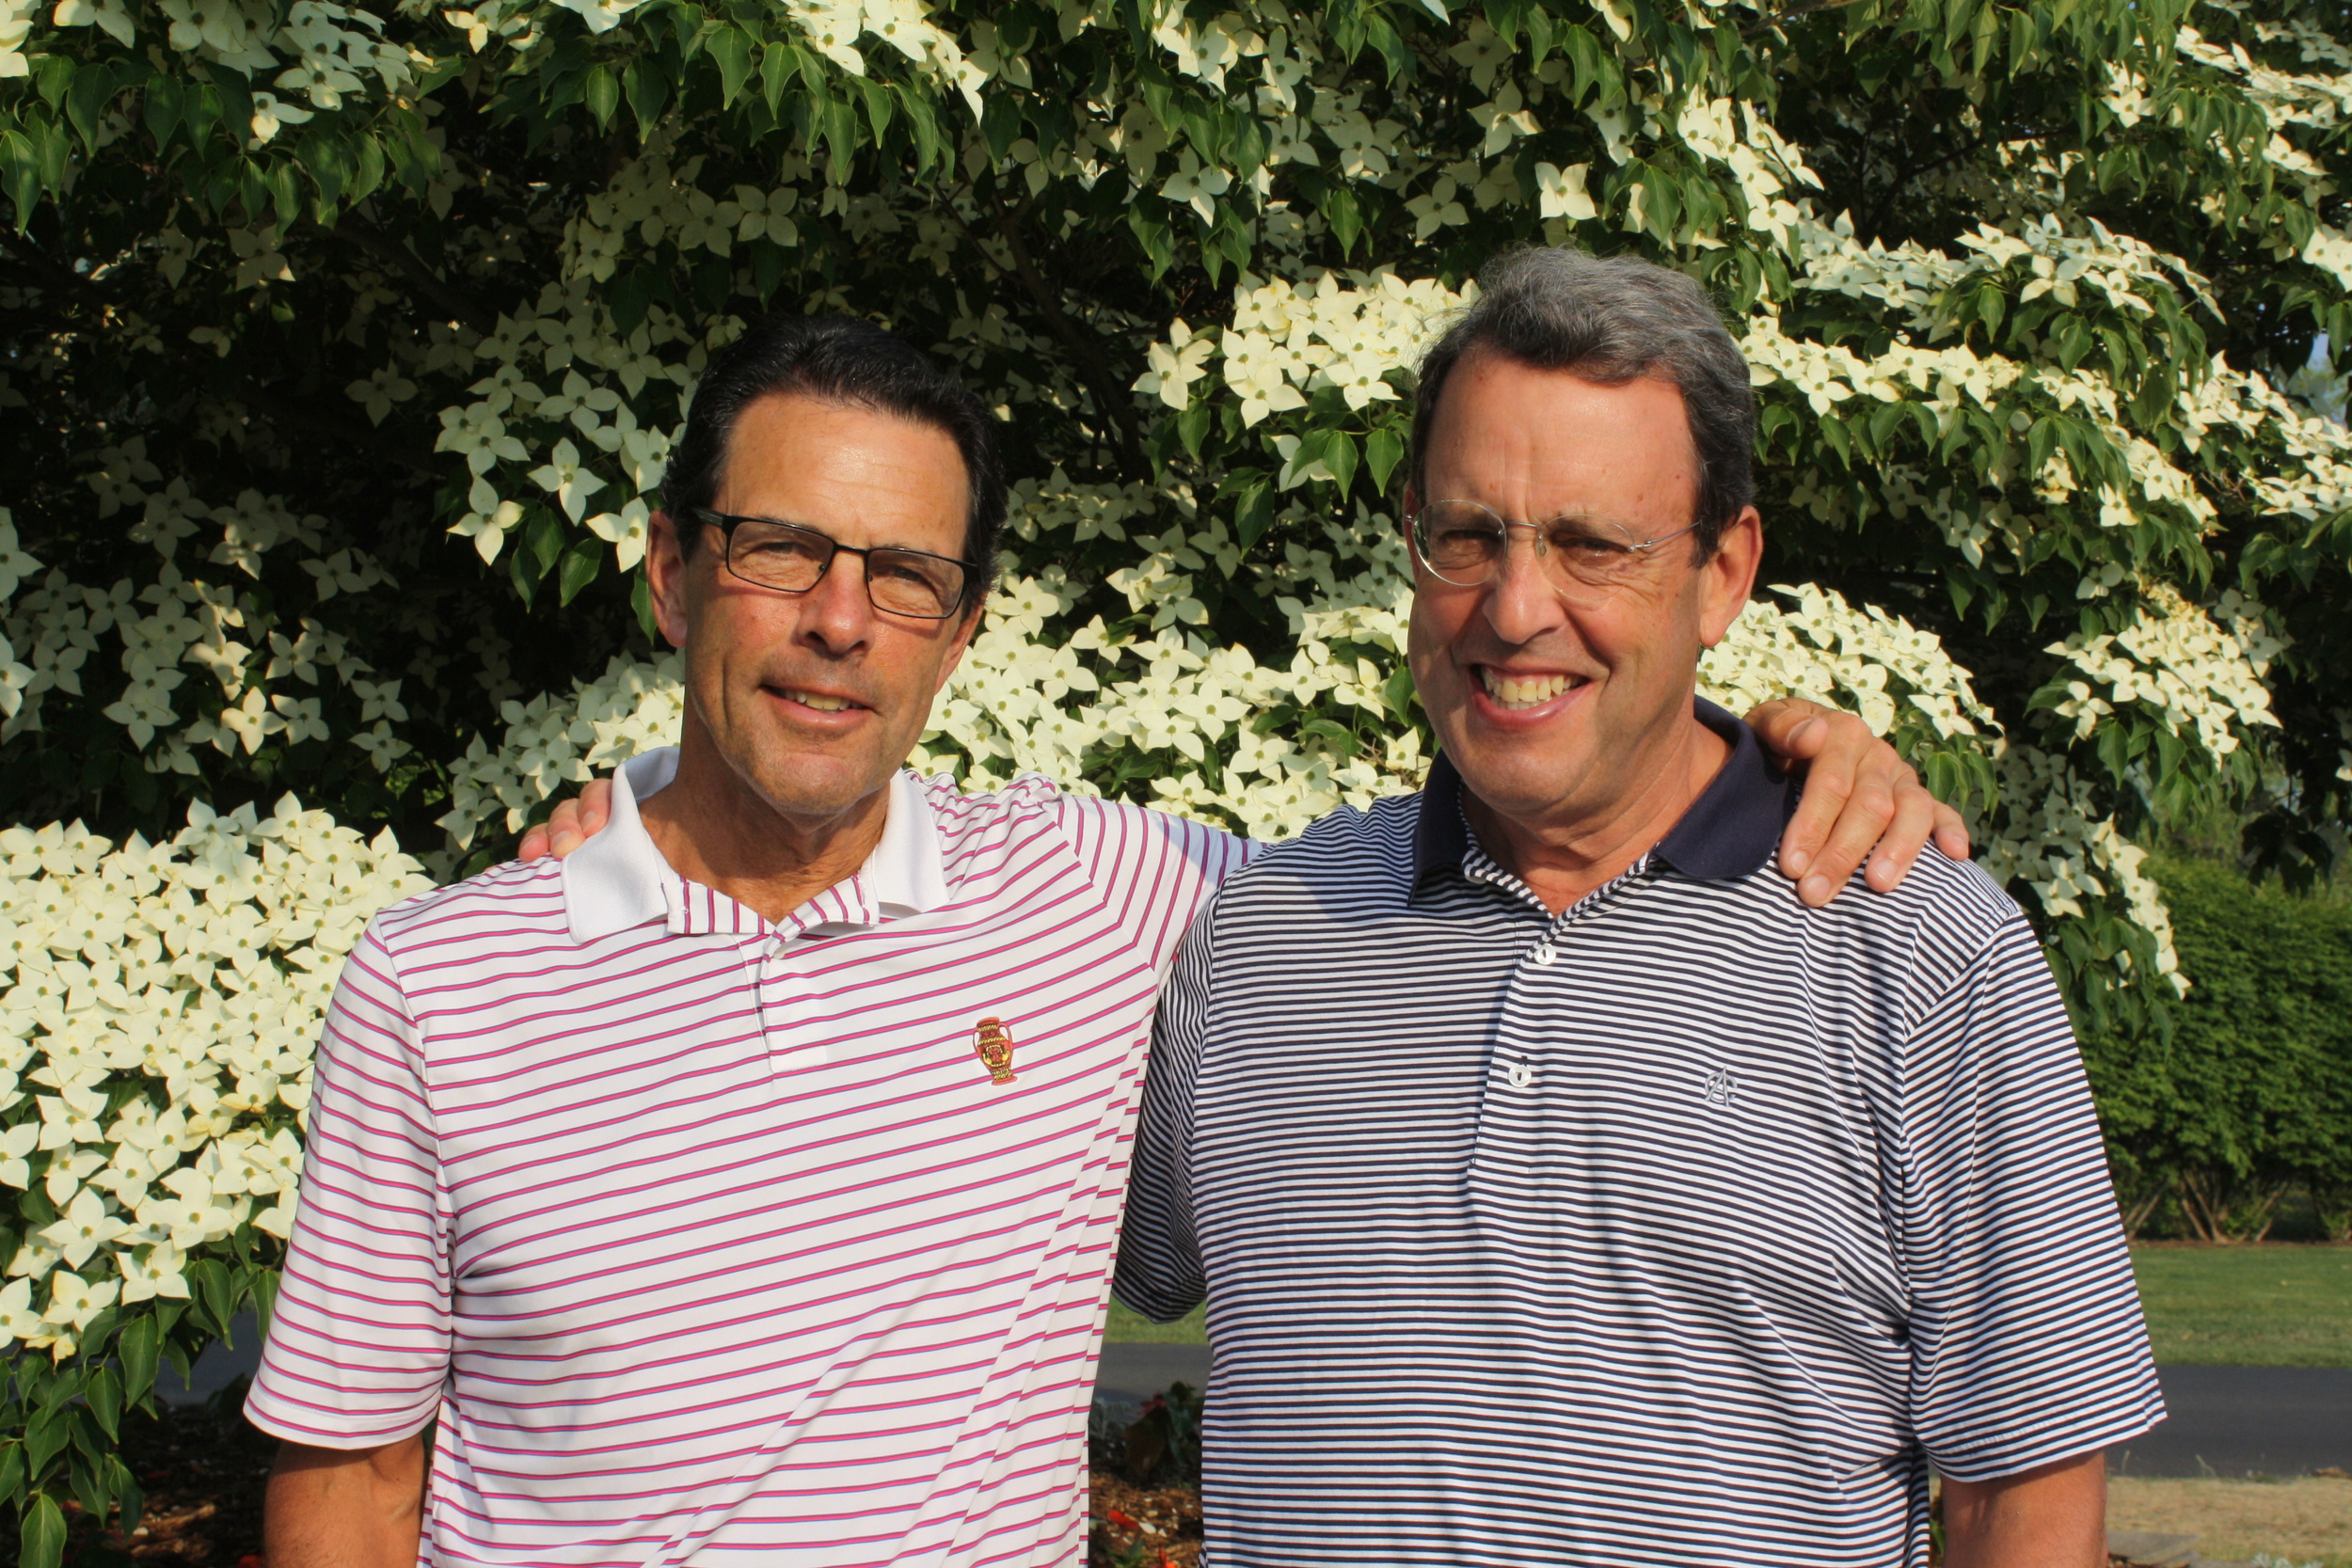 mark and jim 7743.JPG